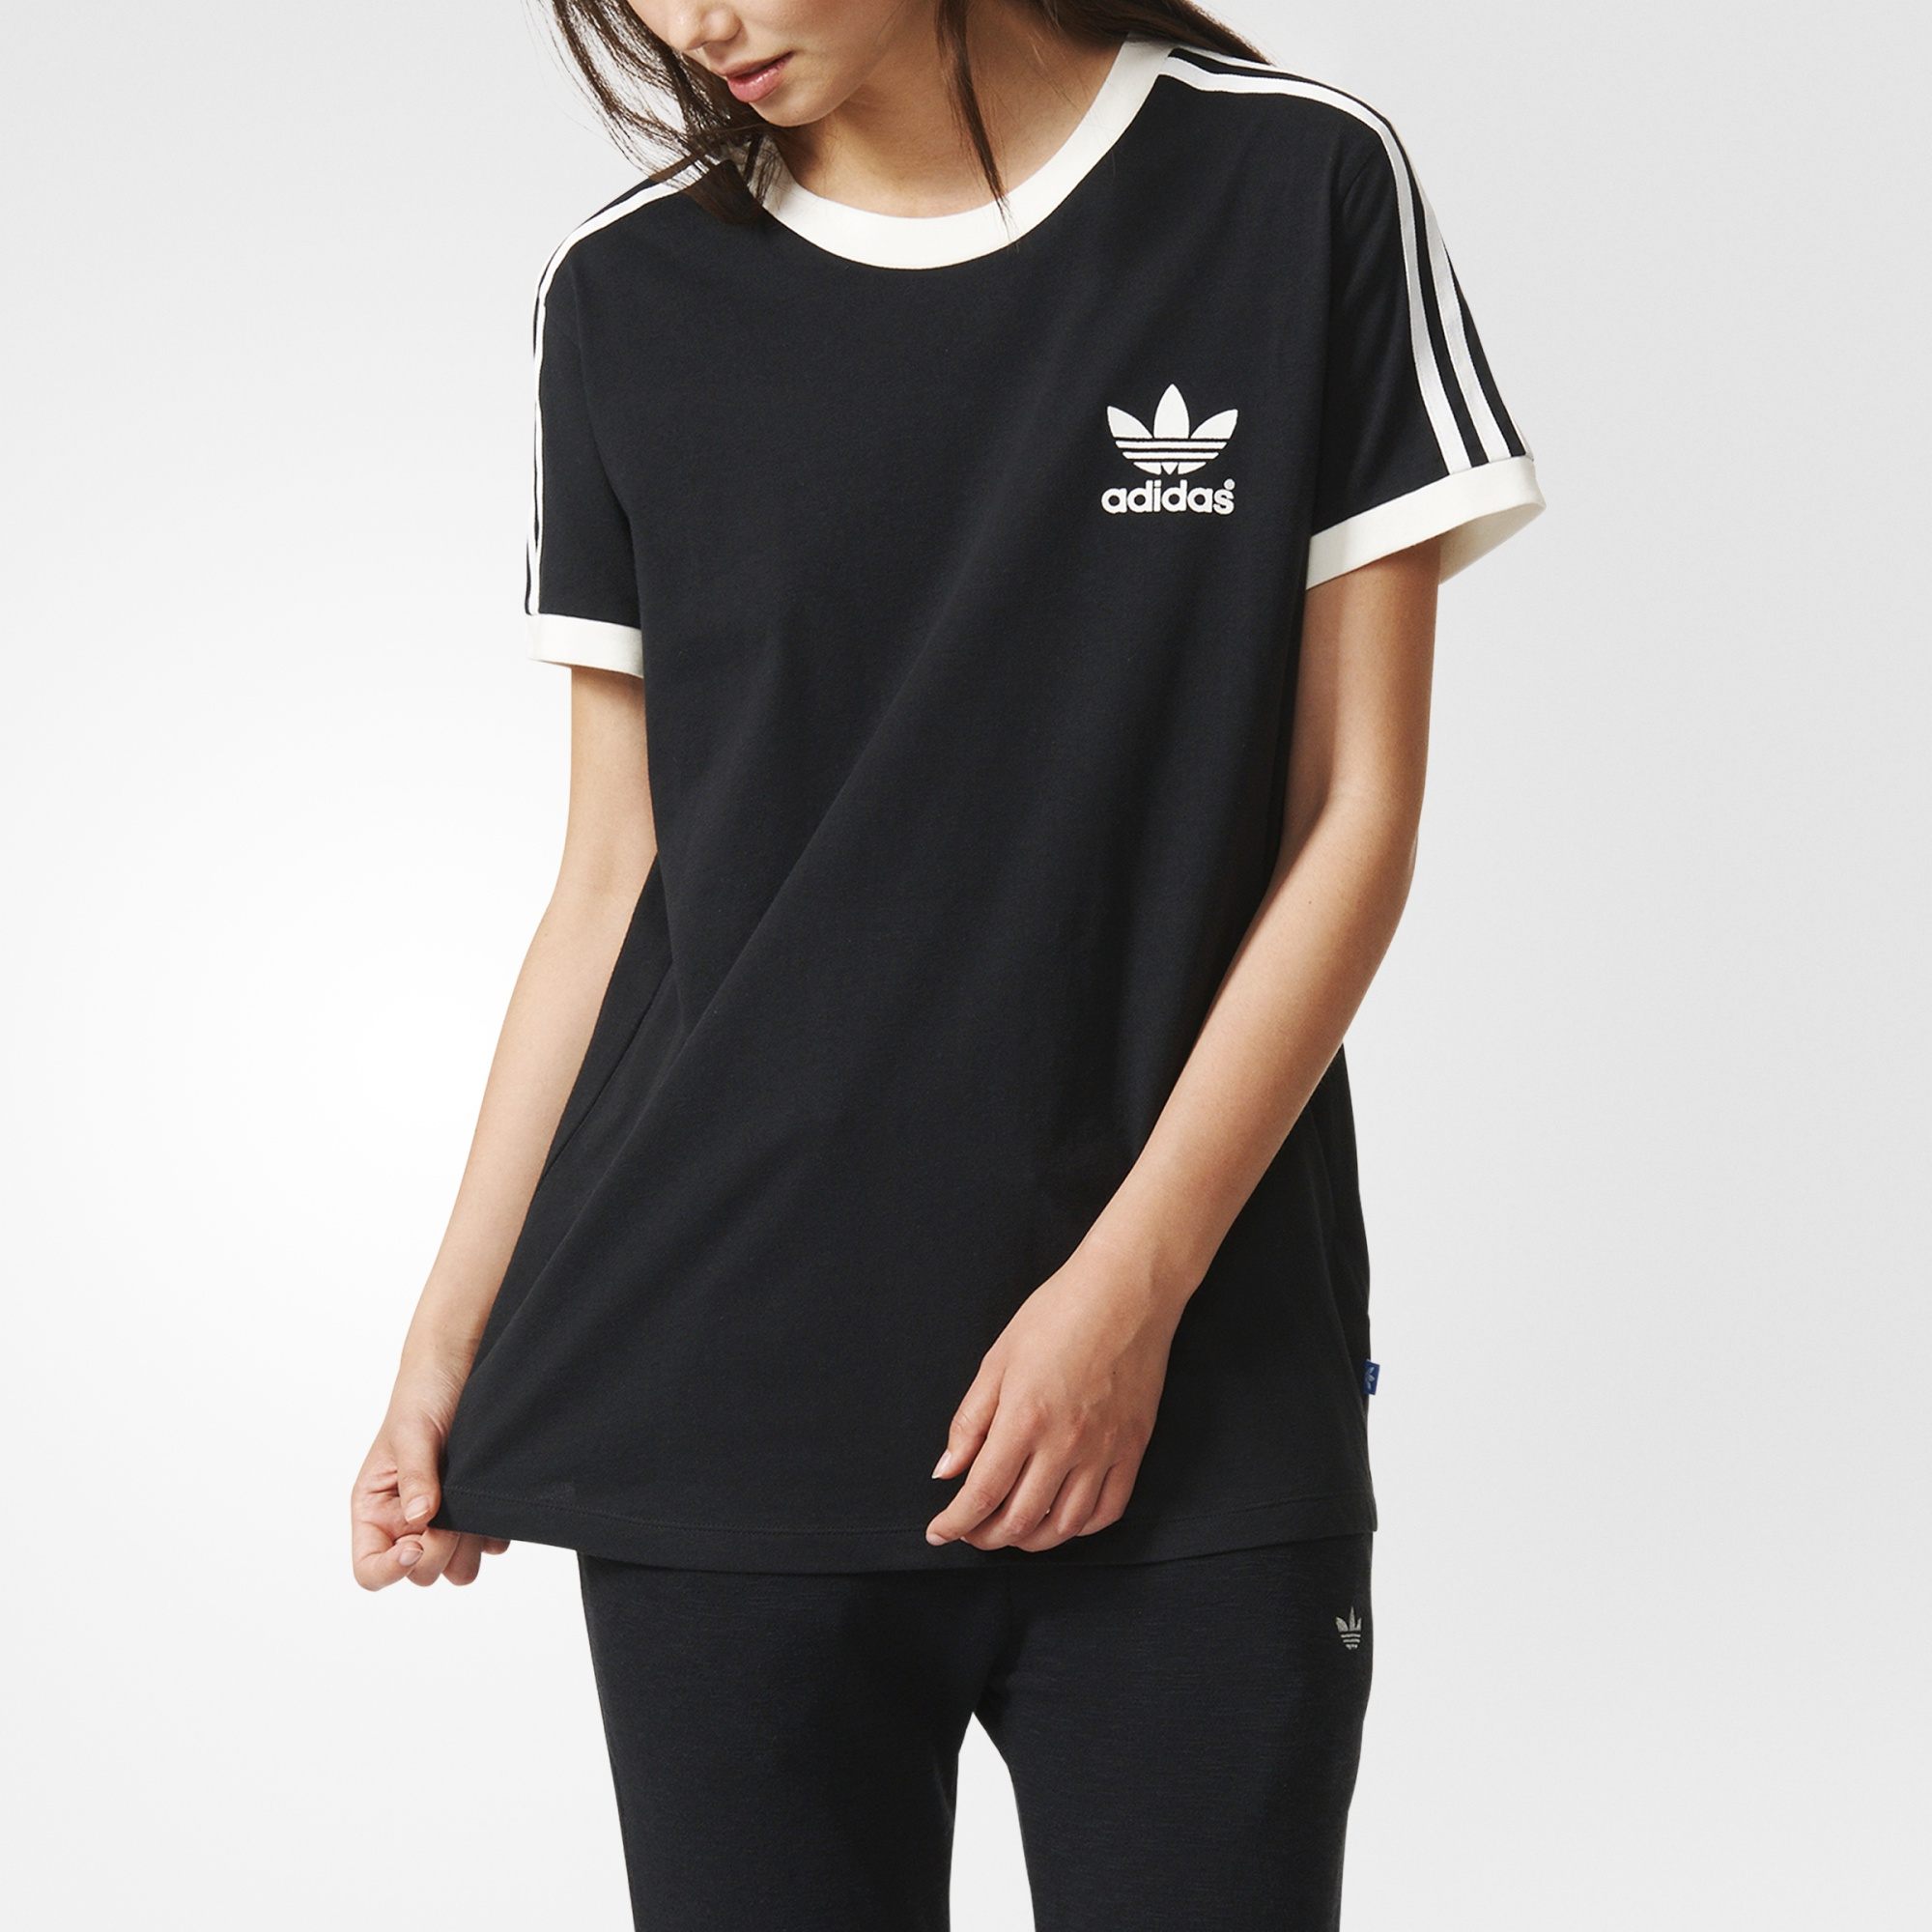 Adidas Womens 3 Stripes Tee Black Adidas Canada